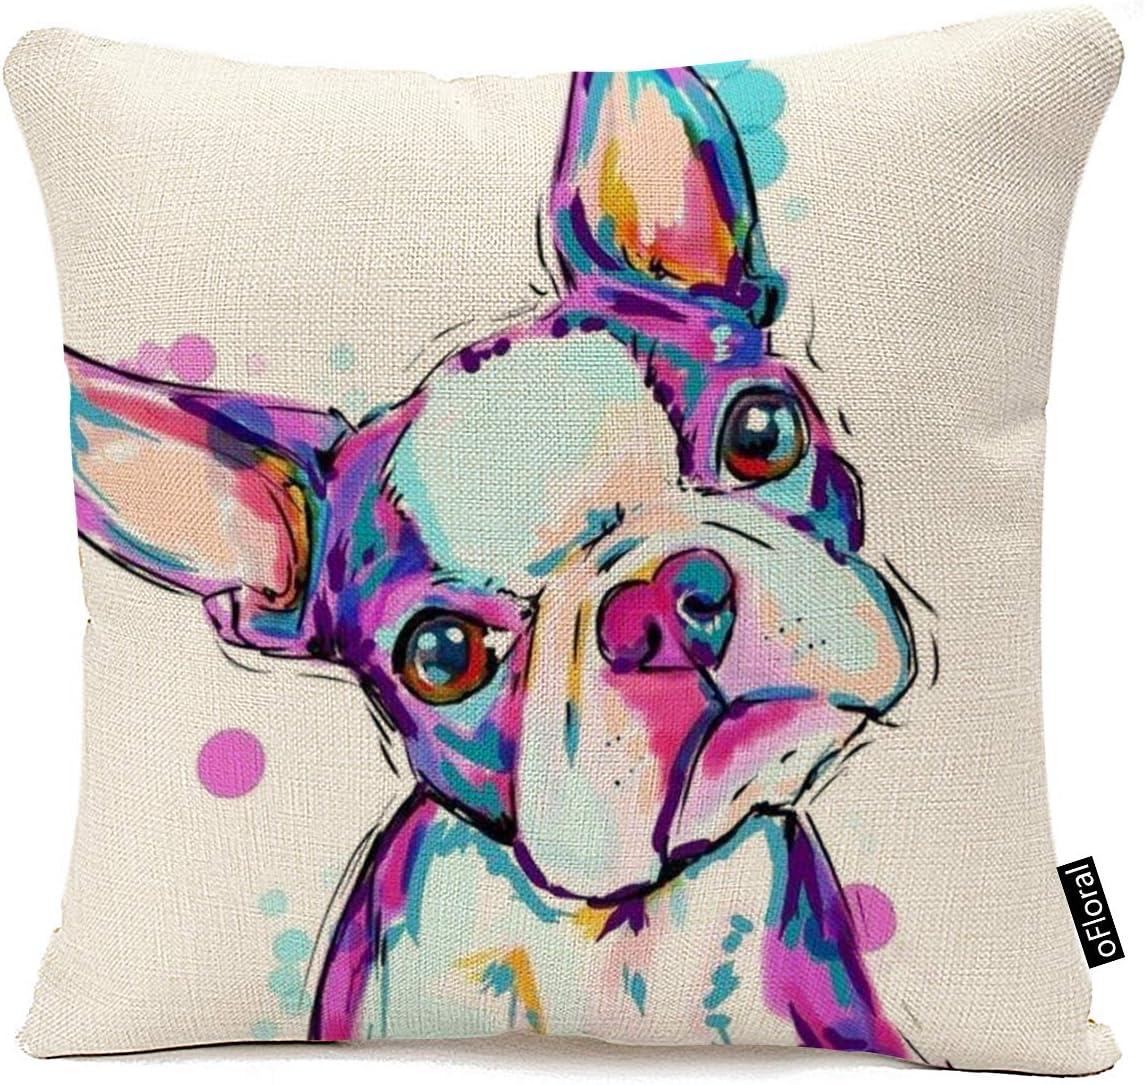 oFloral Animal Cushion Cover Boston Terrier Dog Decorative Cushion Covers Bulldog Throw Pillow Car Chair Home Decor Pillow Case for Sofa 18x18 Inches